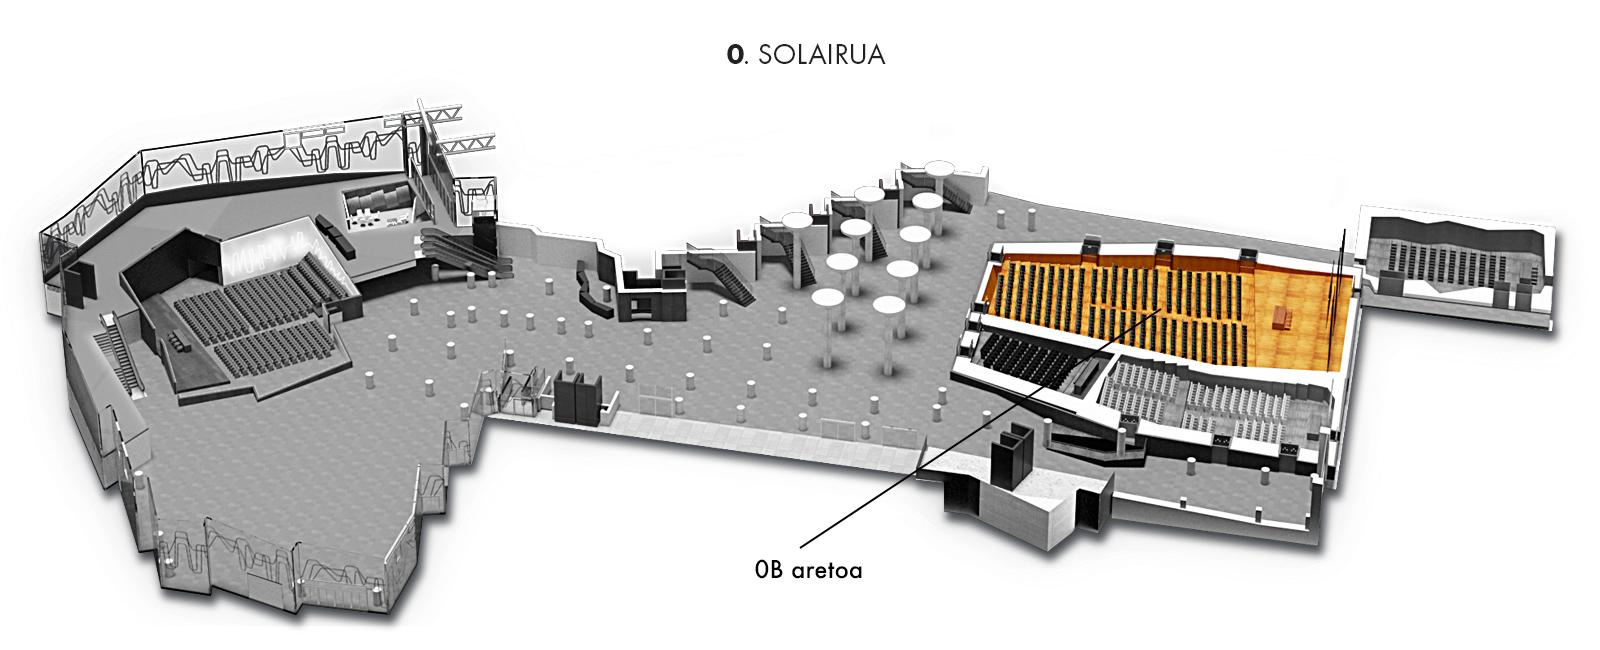 0B aretoa, 0. solairua   Palacio Euskalduna Jauregia